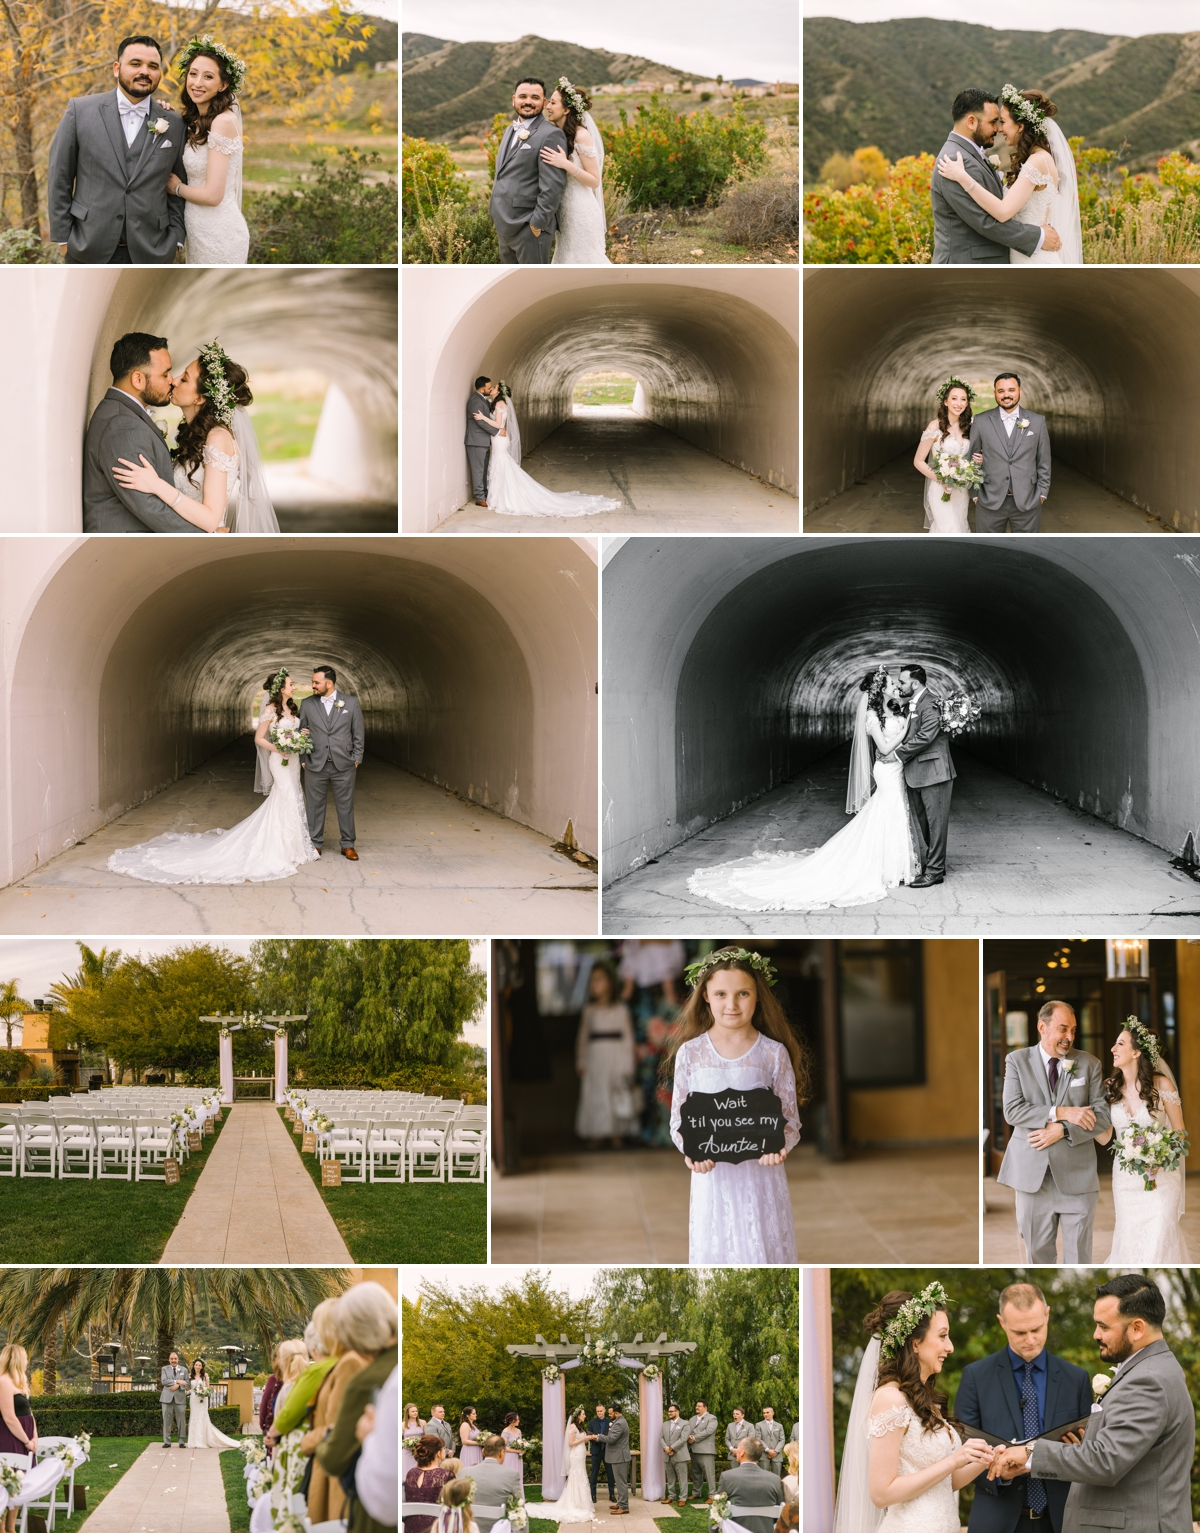 affordable-wedding-photography-orange-county-wedgewood-at-the-retreatwedding-shy-heart-studios-2